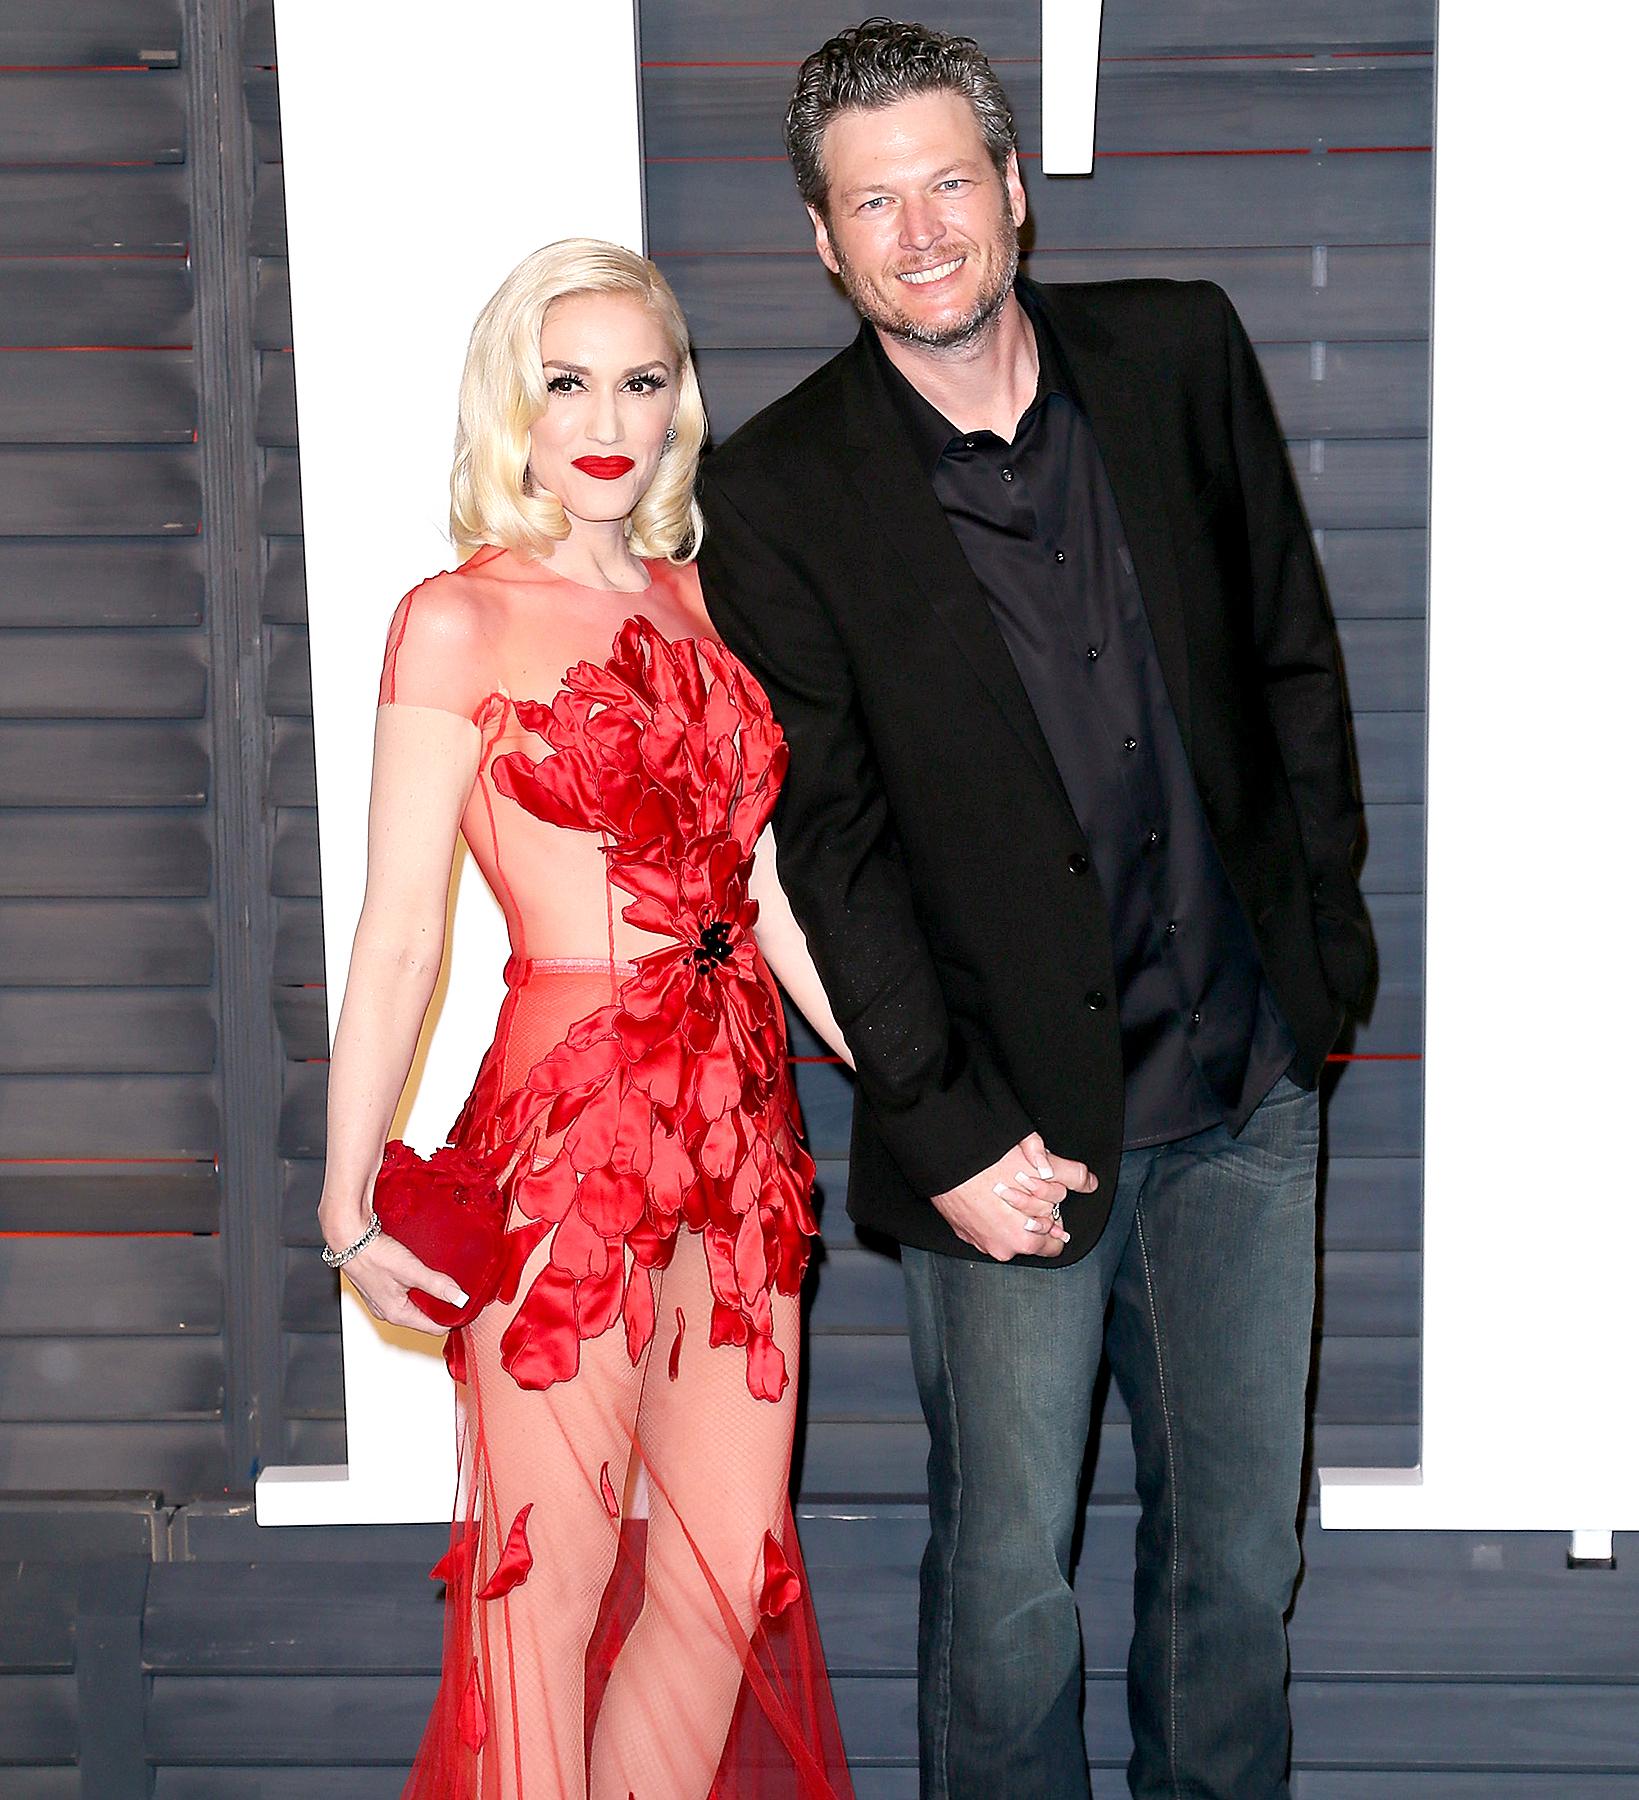 Gwen Stefani and Blake Shelton arrive at the 2016 Vanity Fair Oscar Party.